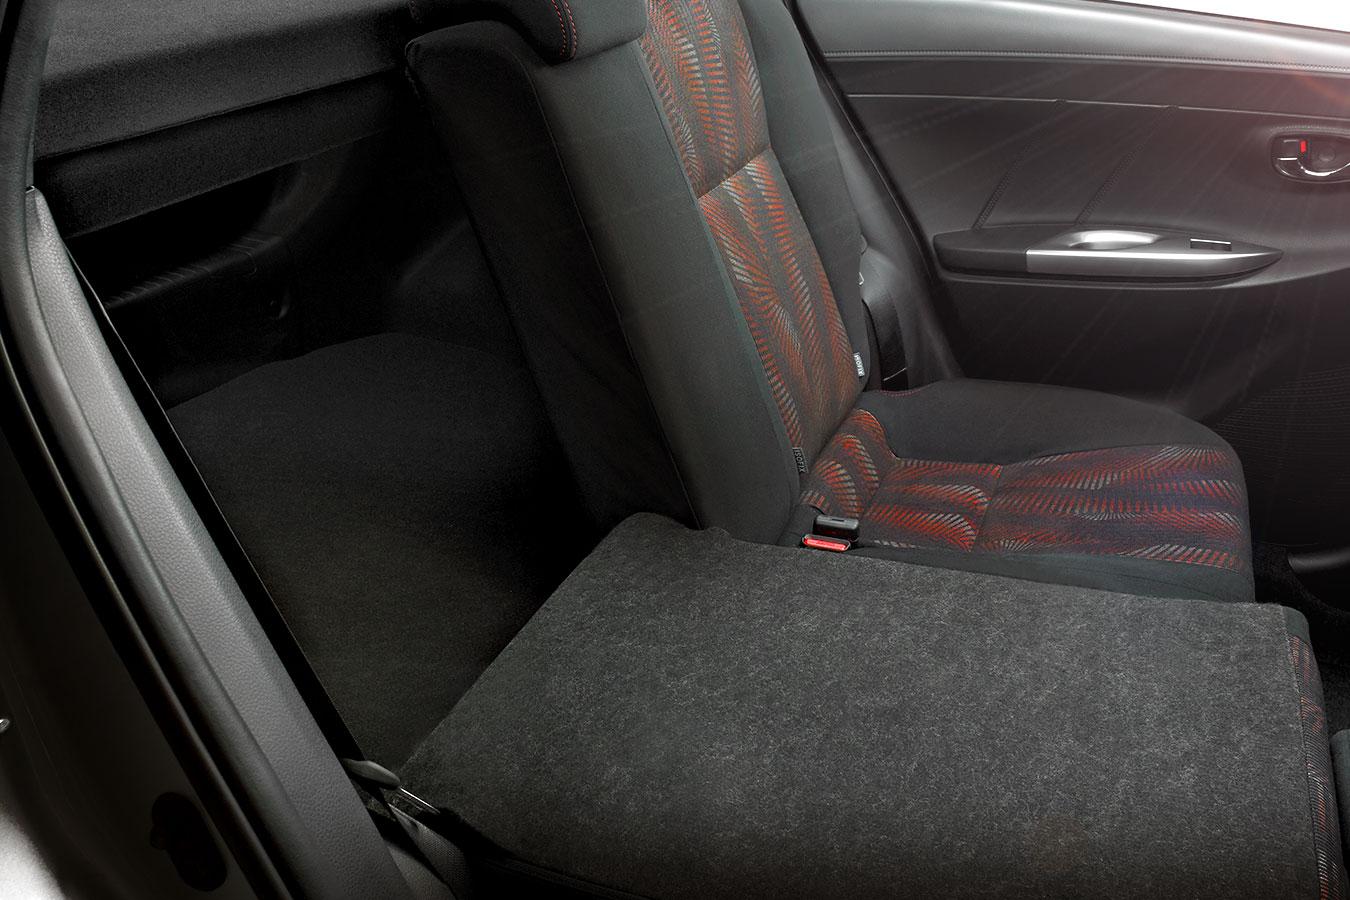 Toyota Yaris Hatchback 2017 en México asientos abatibles detalle